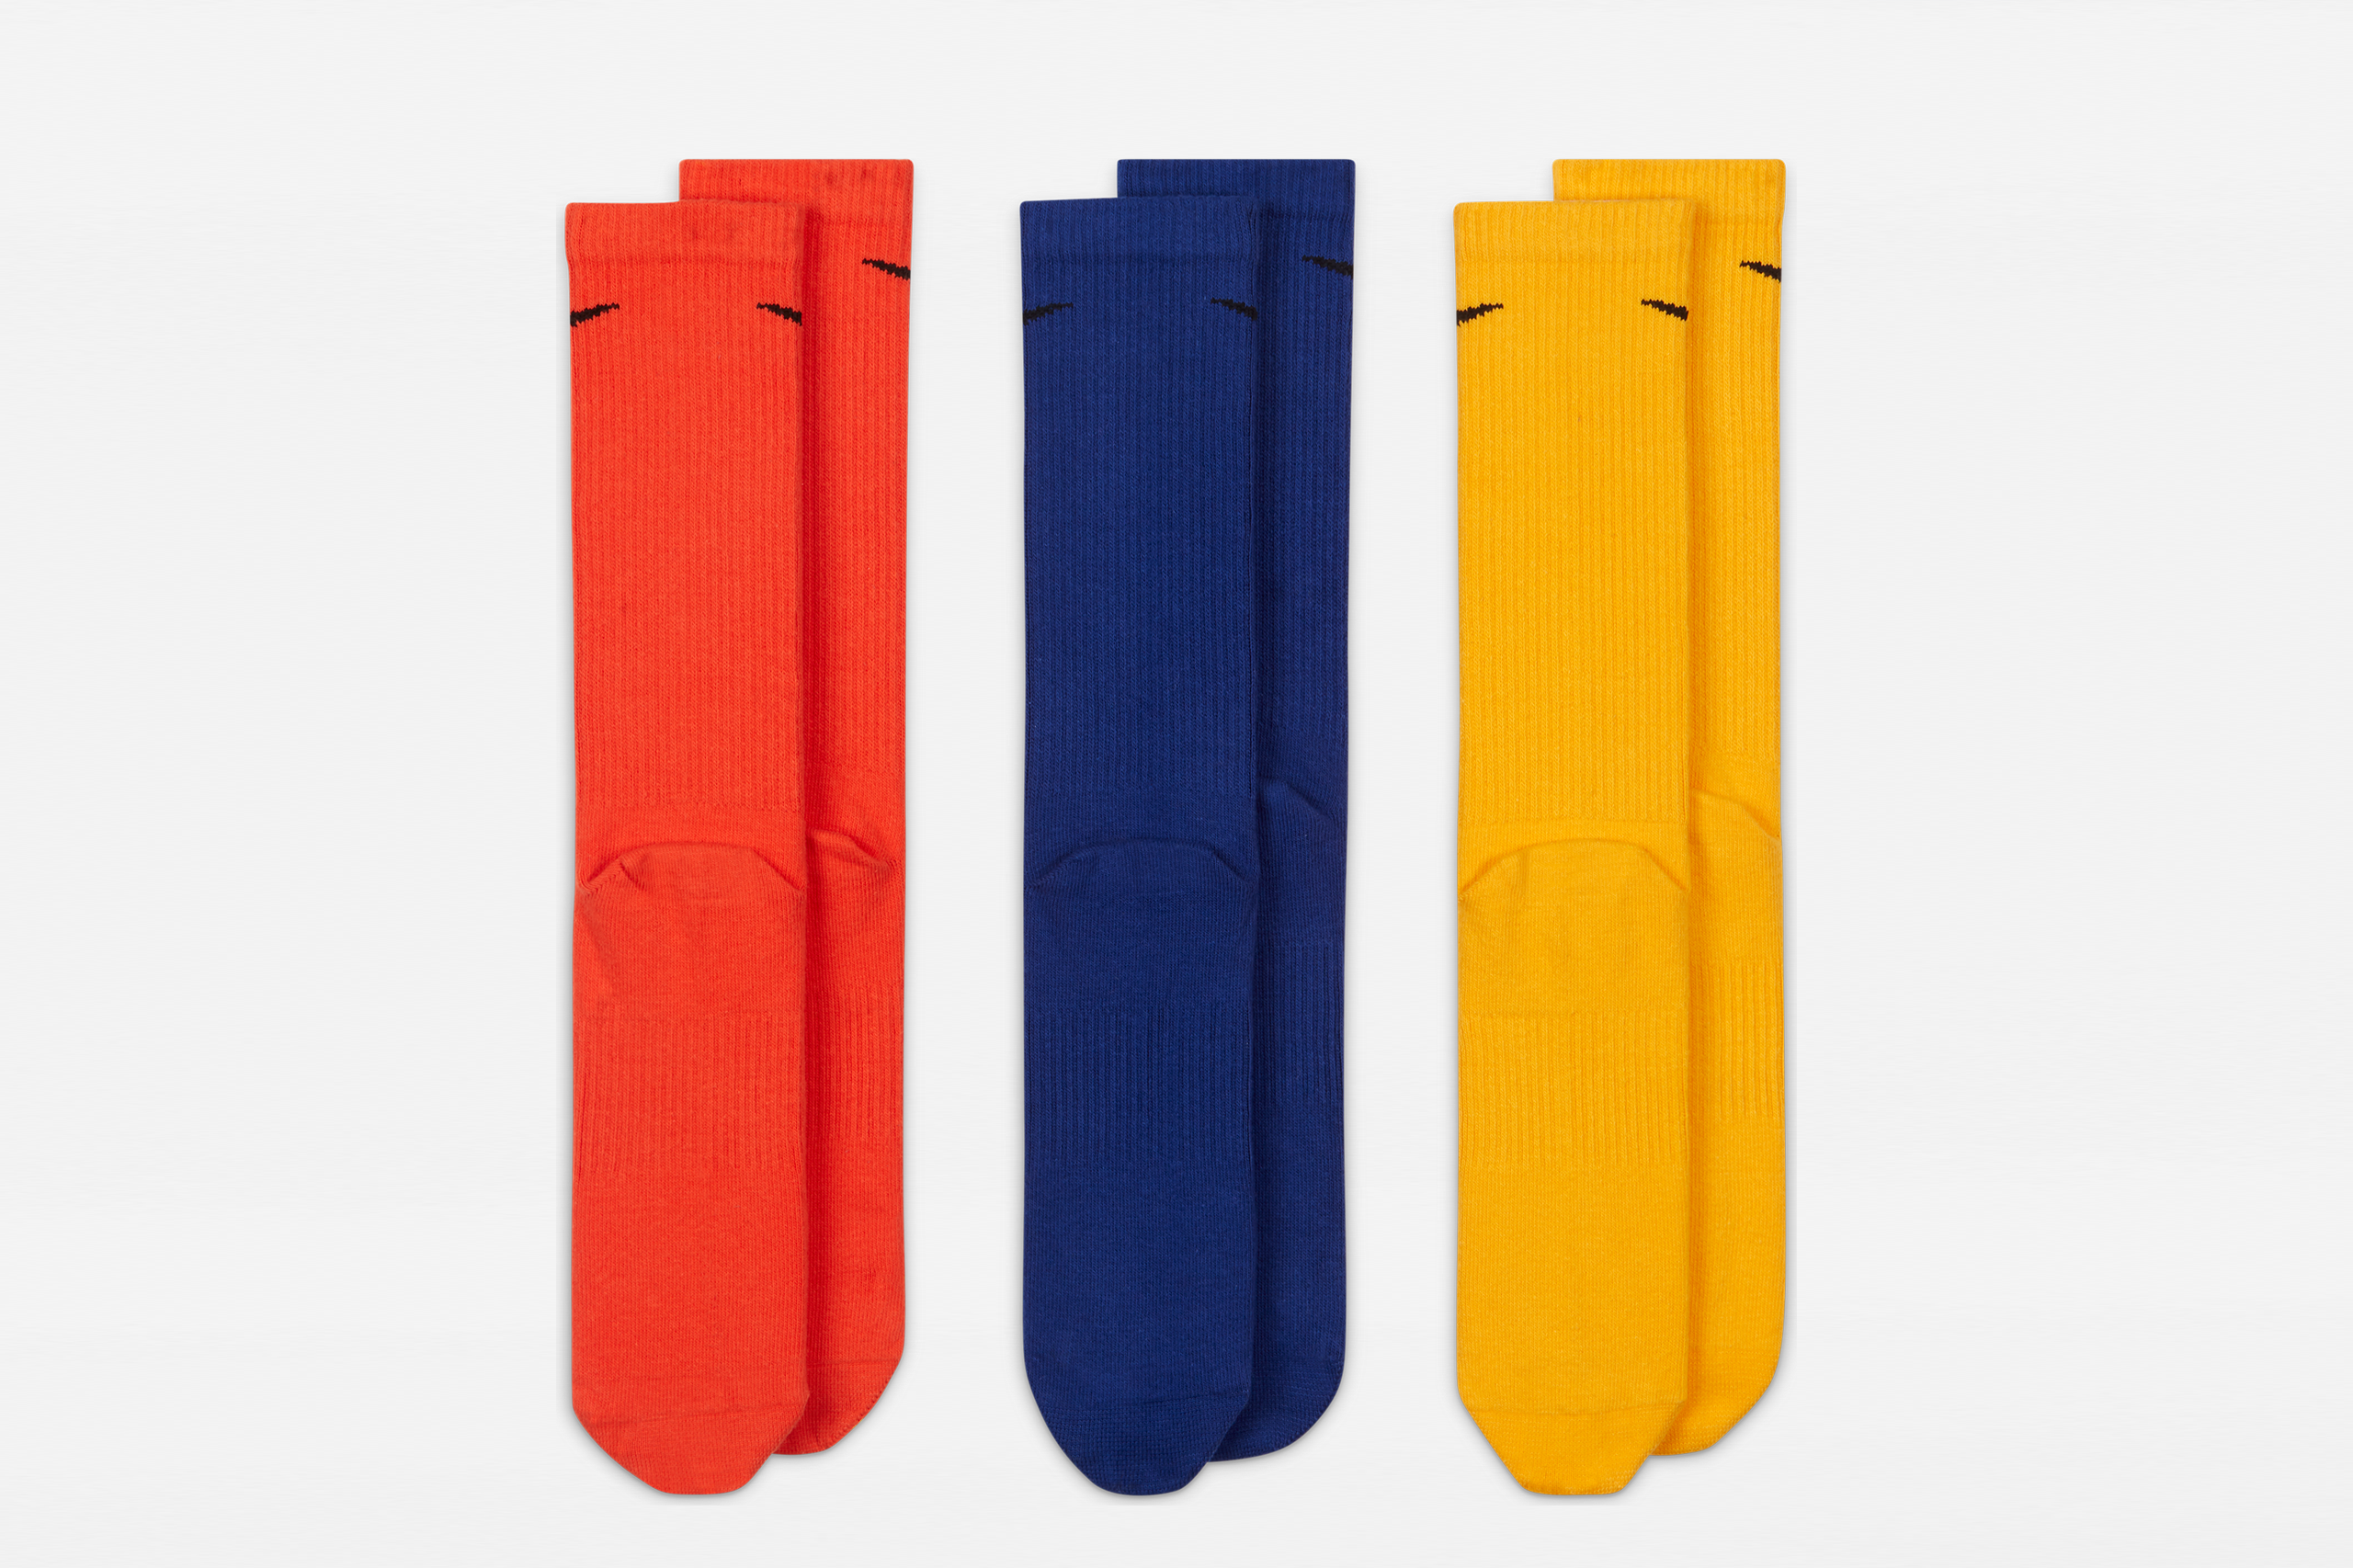 Nike Everyday Plus Lightweight Training Crew Socks Multicolor